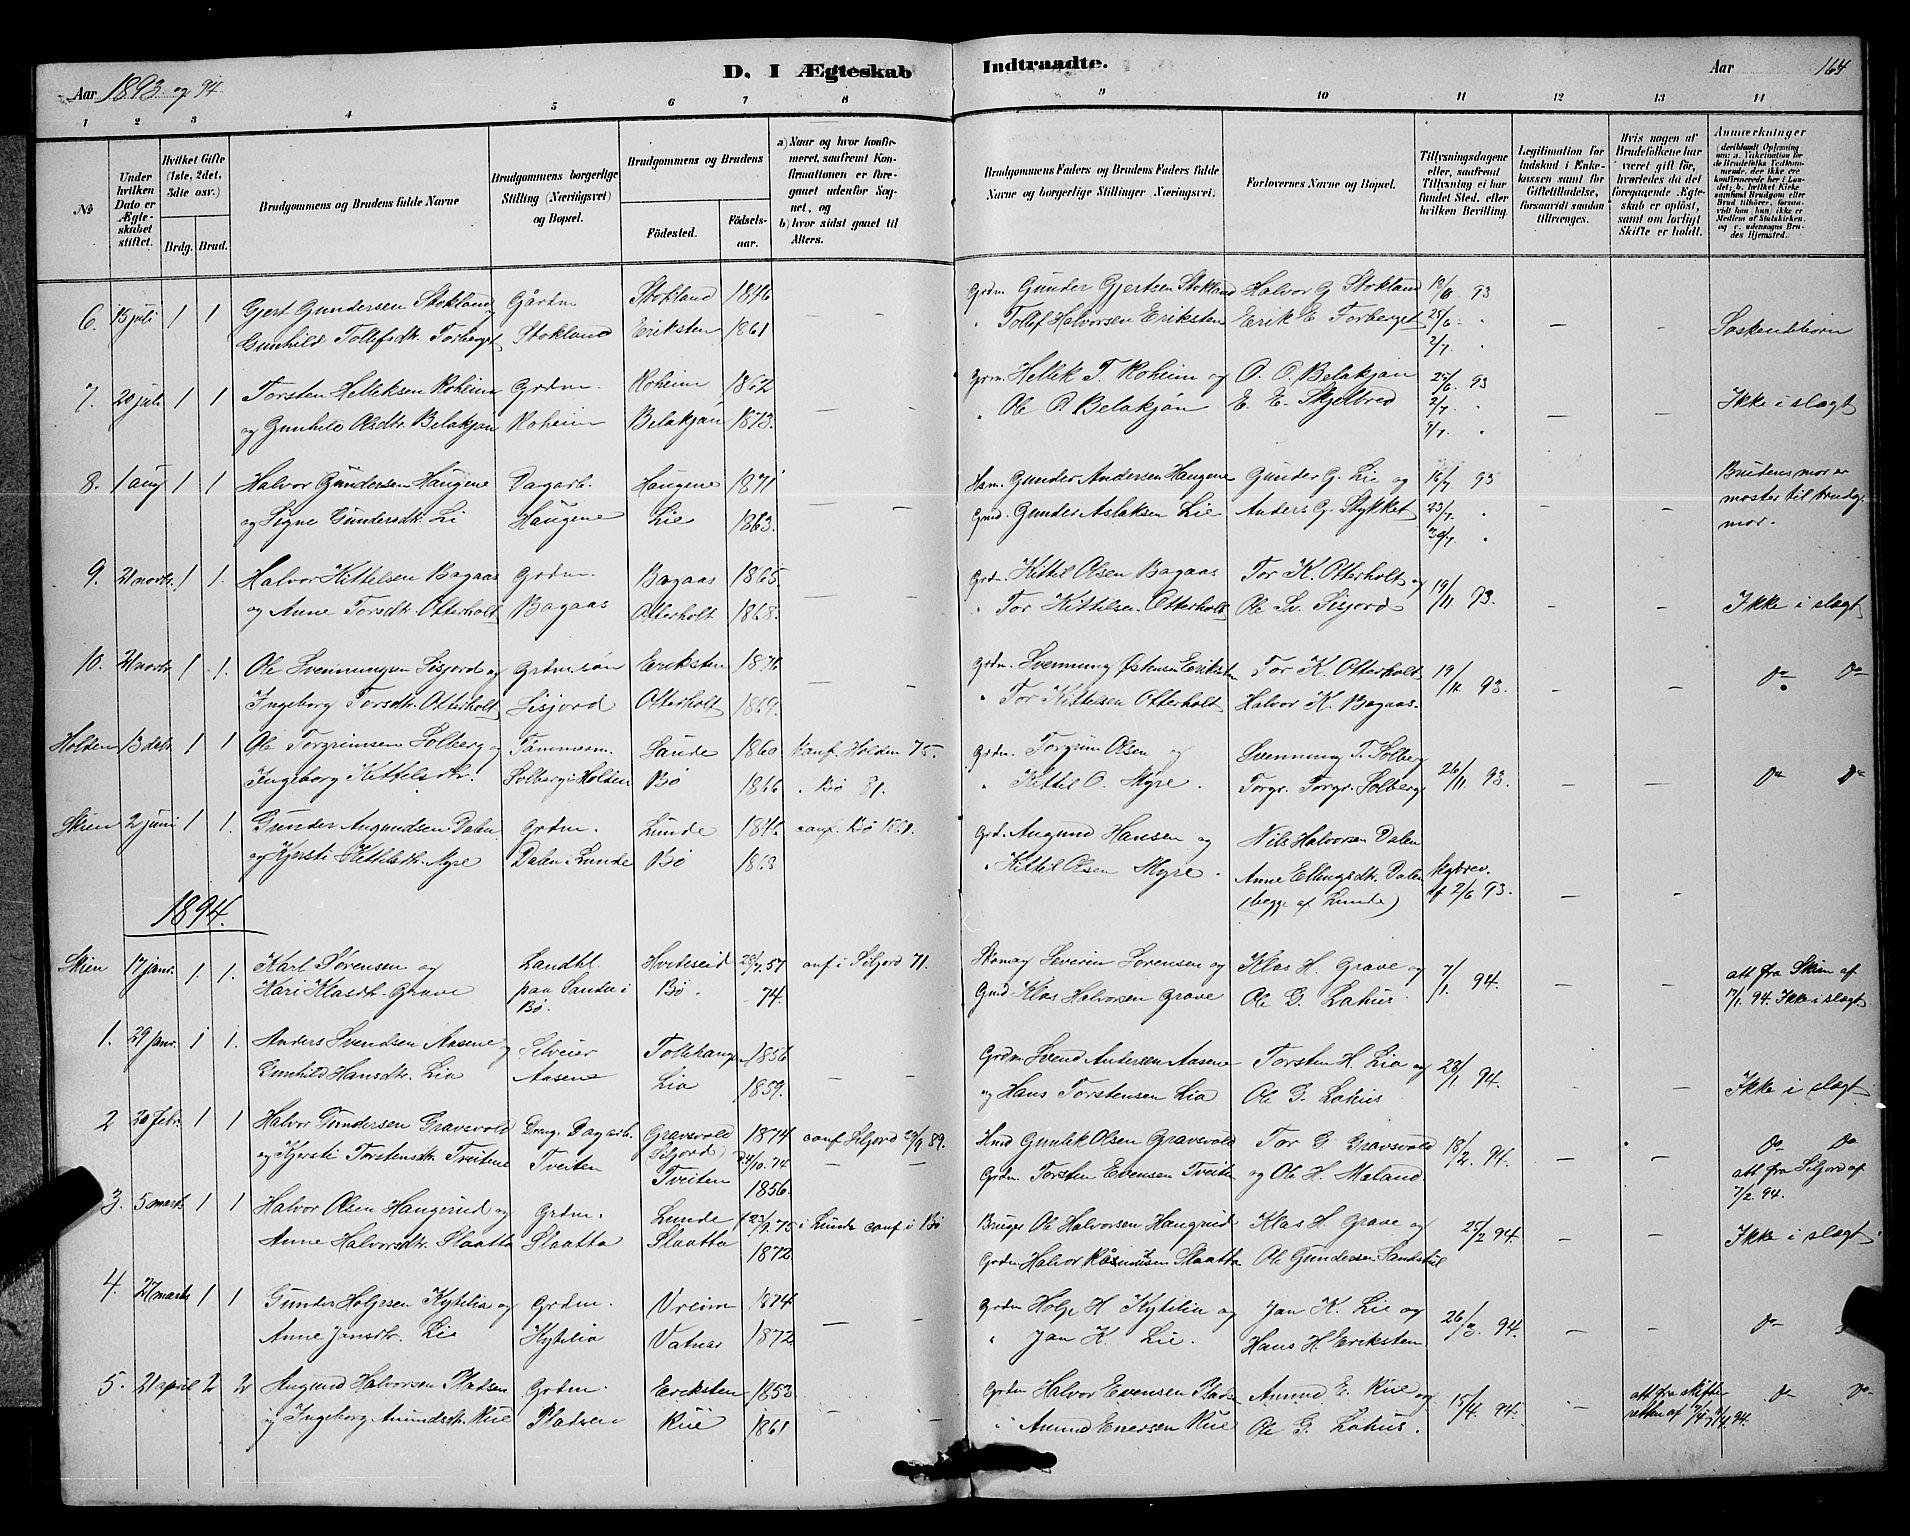 SAKO, Bø kirkebøker, G/Ga/L0005: Klokkerbok nr. 5, 1883-1897, s. 164